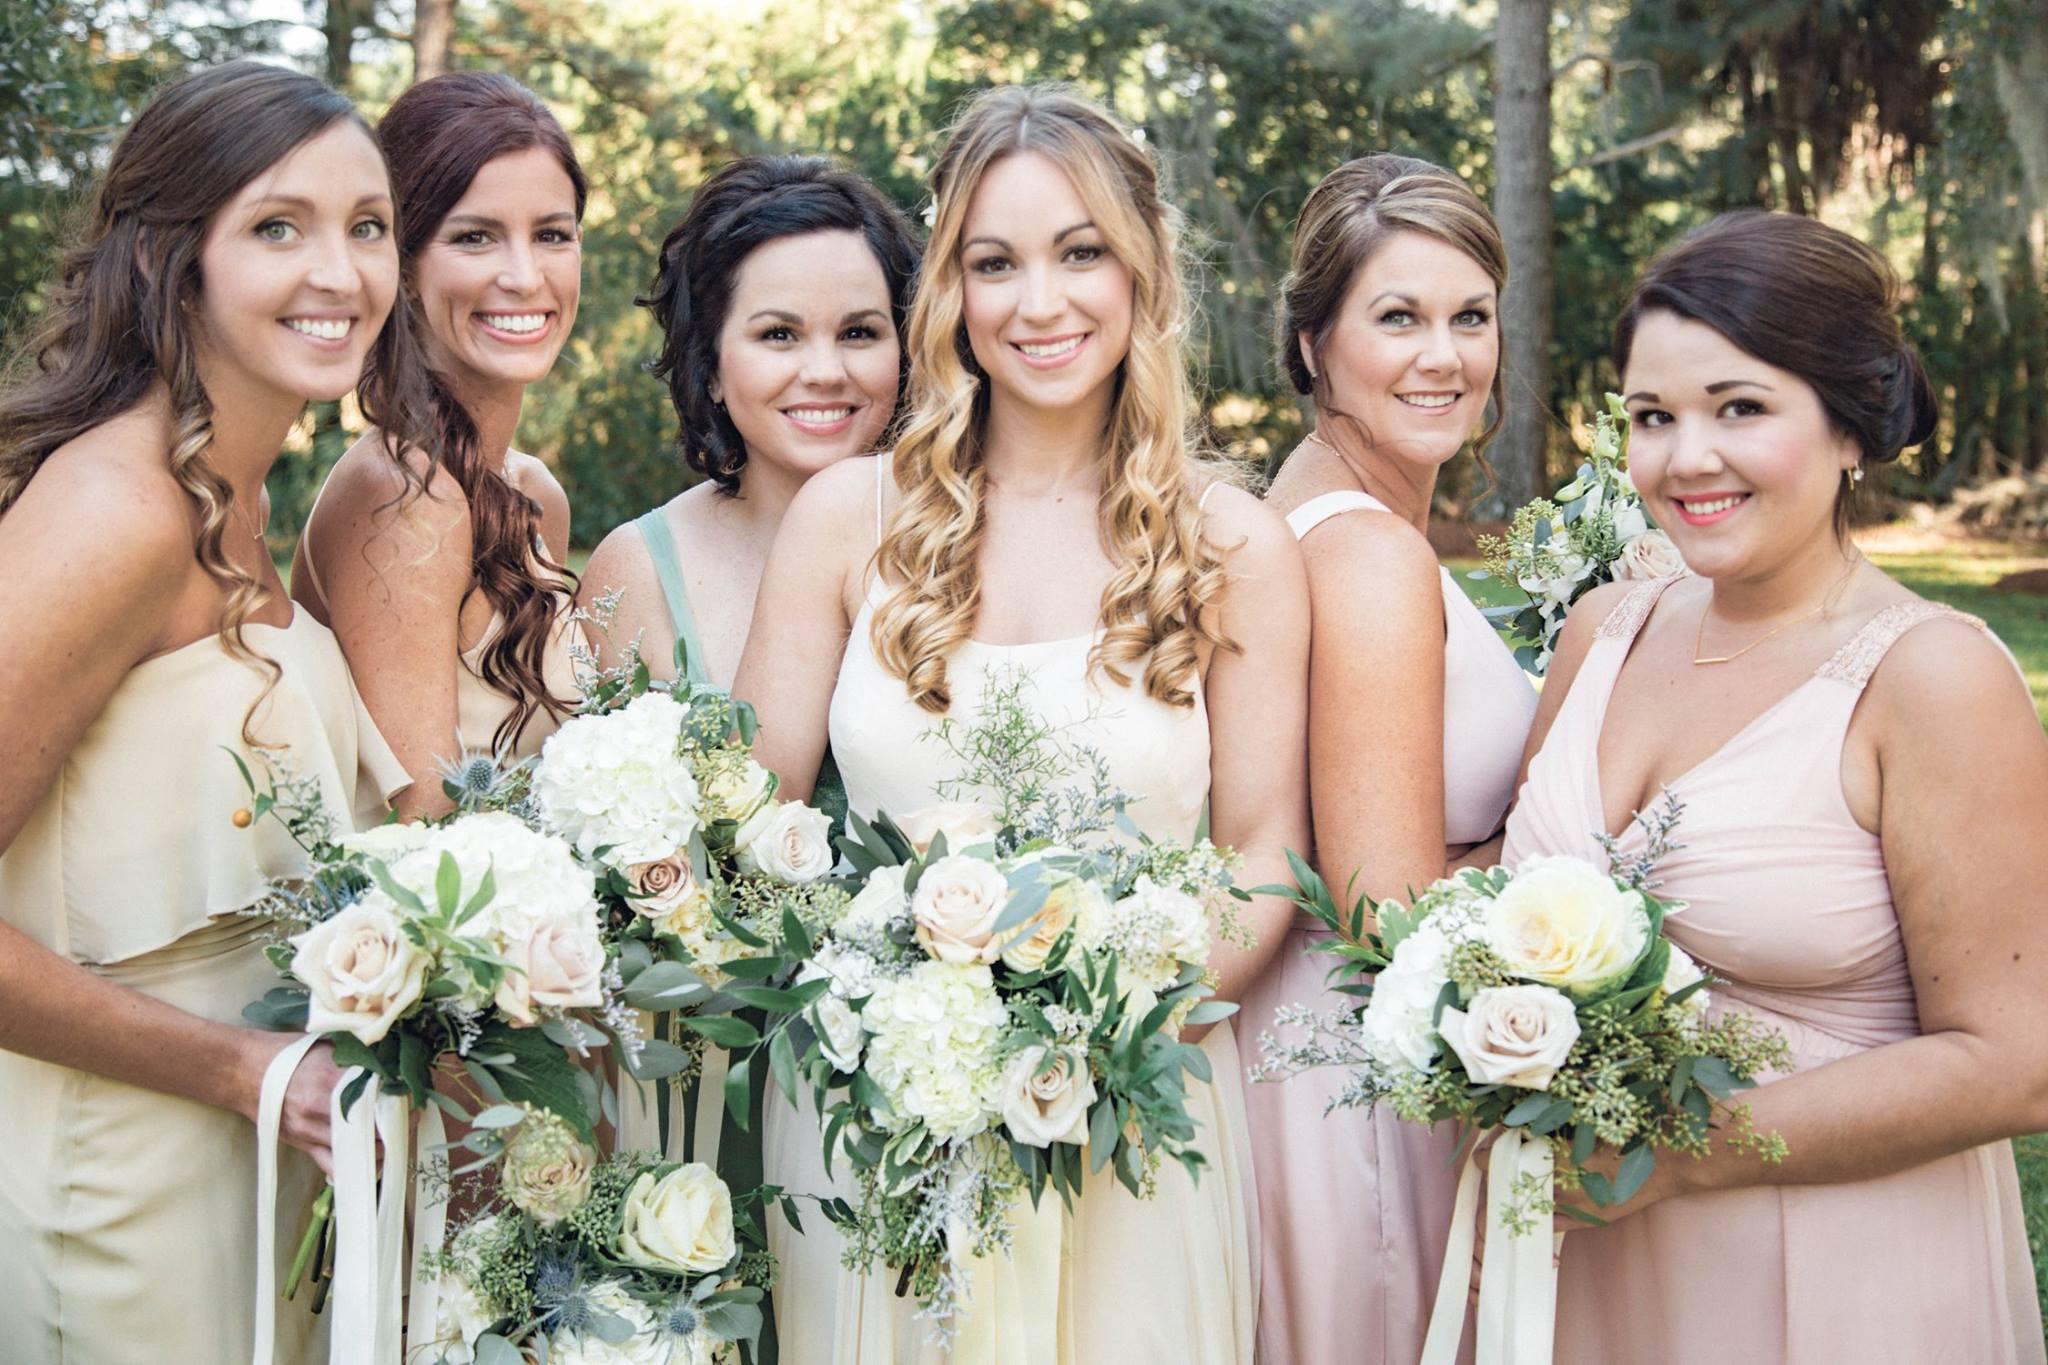 lindy-garvin-rebecca-schoneveld-vivian-sage-blush-wedding-dress-blush-bridal-gown-handmade-wedding-dress-ivory-and-beau-bridal-boutique-savannah-wedding-dresses-savannah-bridal-boutique-savannah-weddings-savannah-brides-jacksonville-bridal-boutique-8.jpg